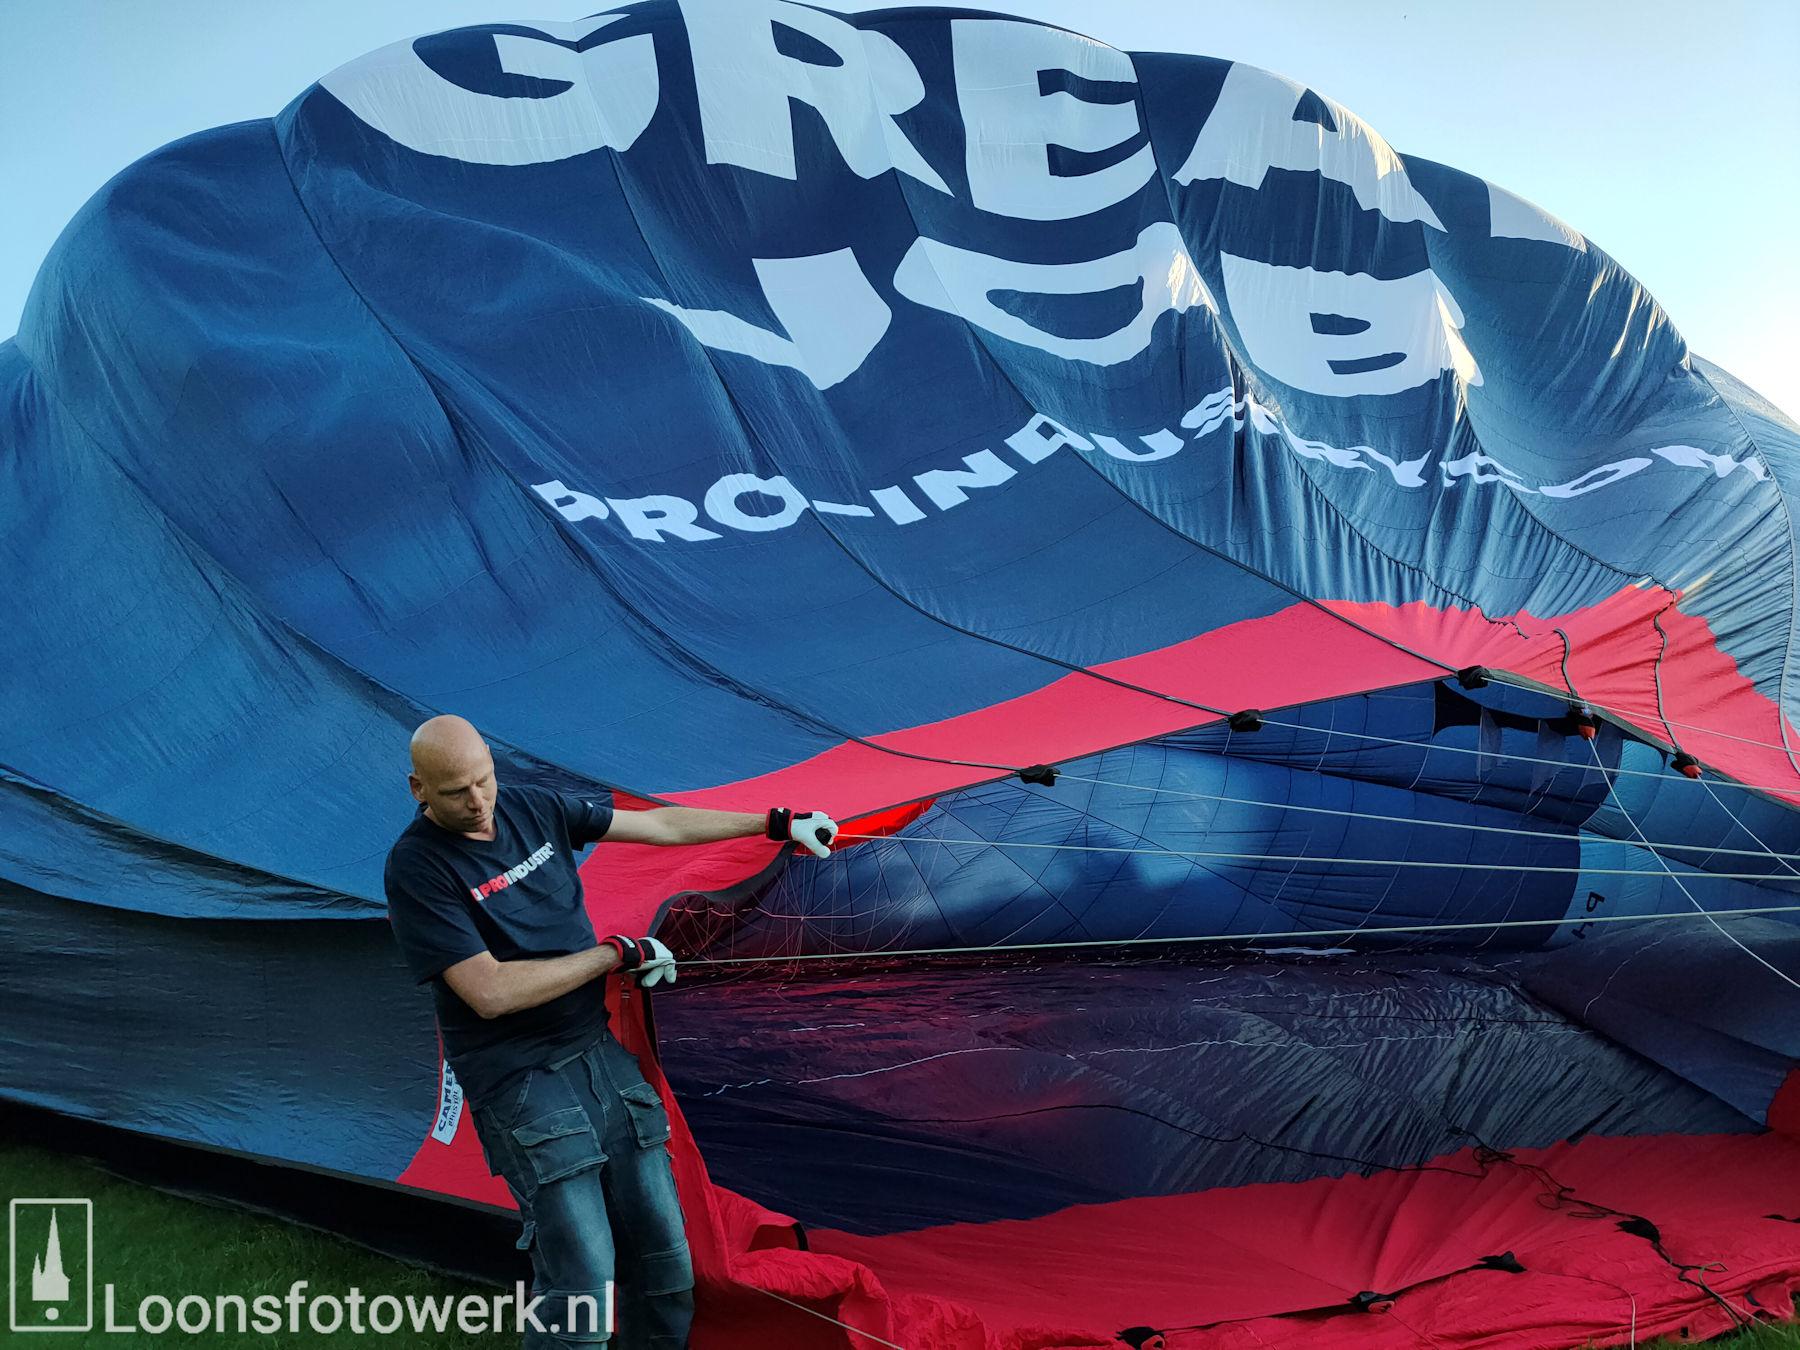 Ballonvaart vanaf de Kasteelweide 15